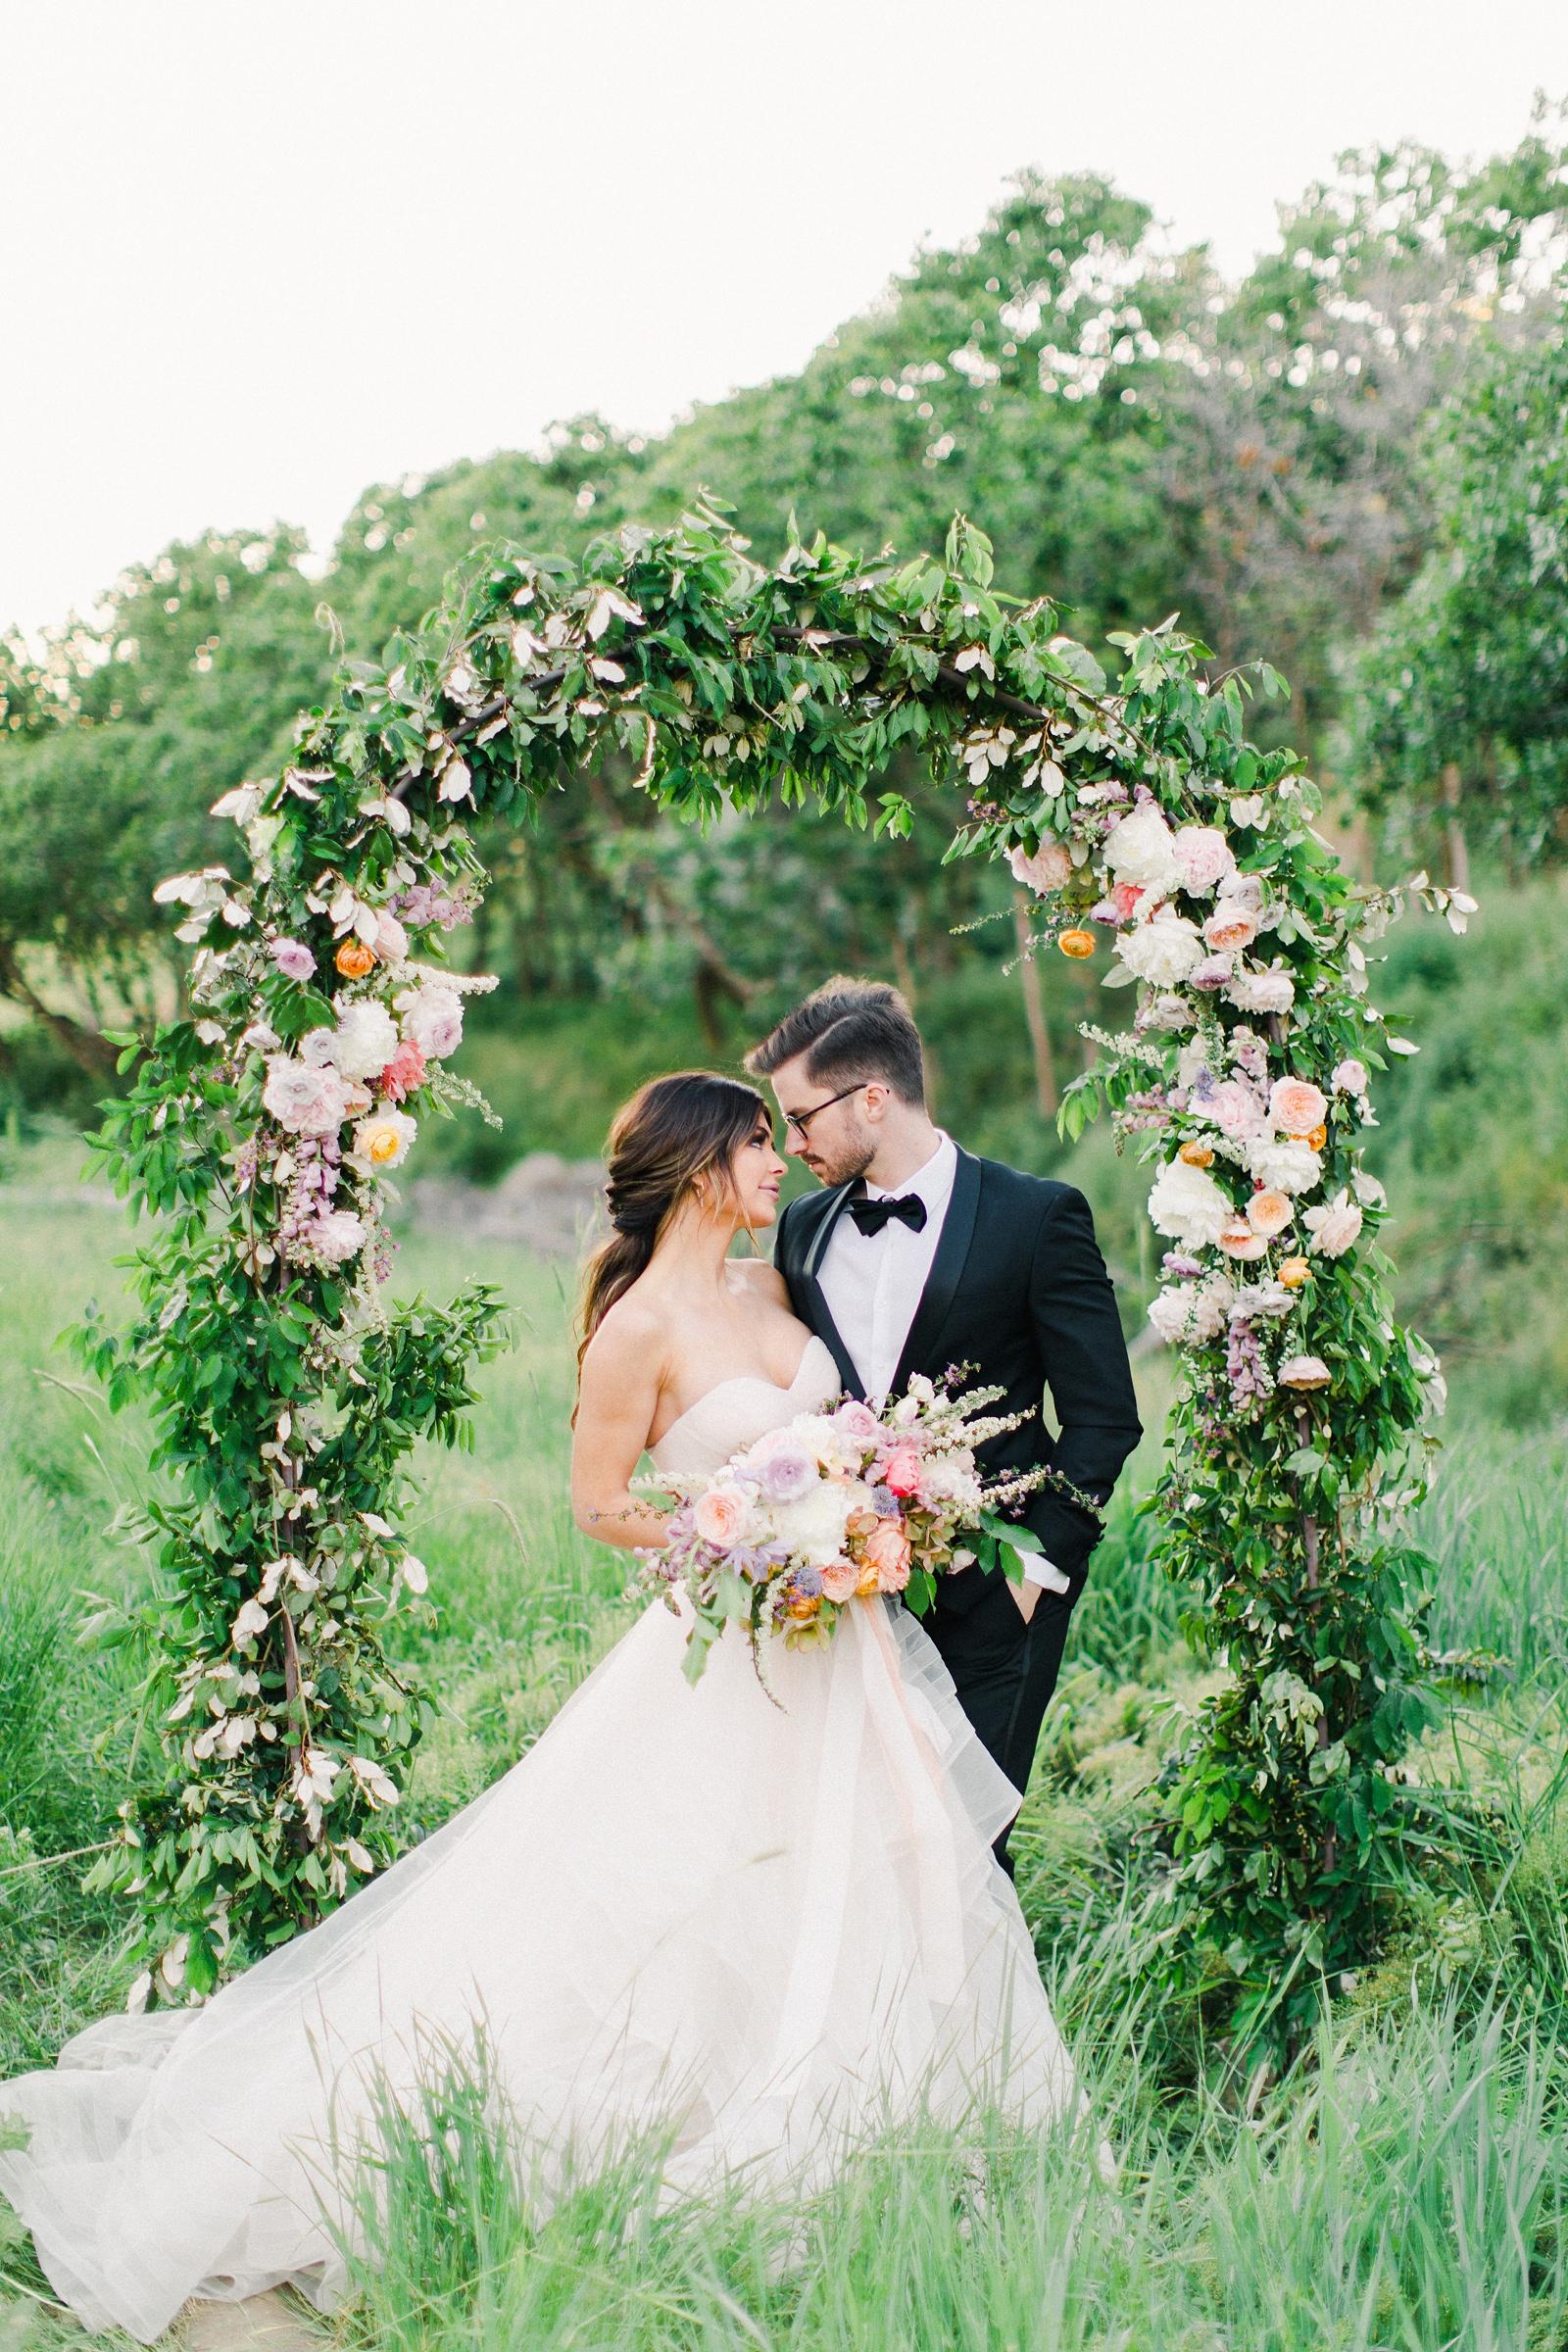 Outdoor Spring Secret Garden Wedding, Provo Utah Film Wedding Photography, bride and groom with floral arch wedding flowers